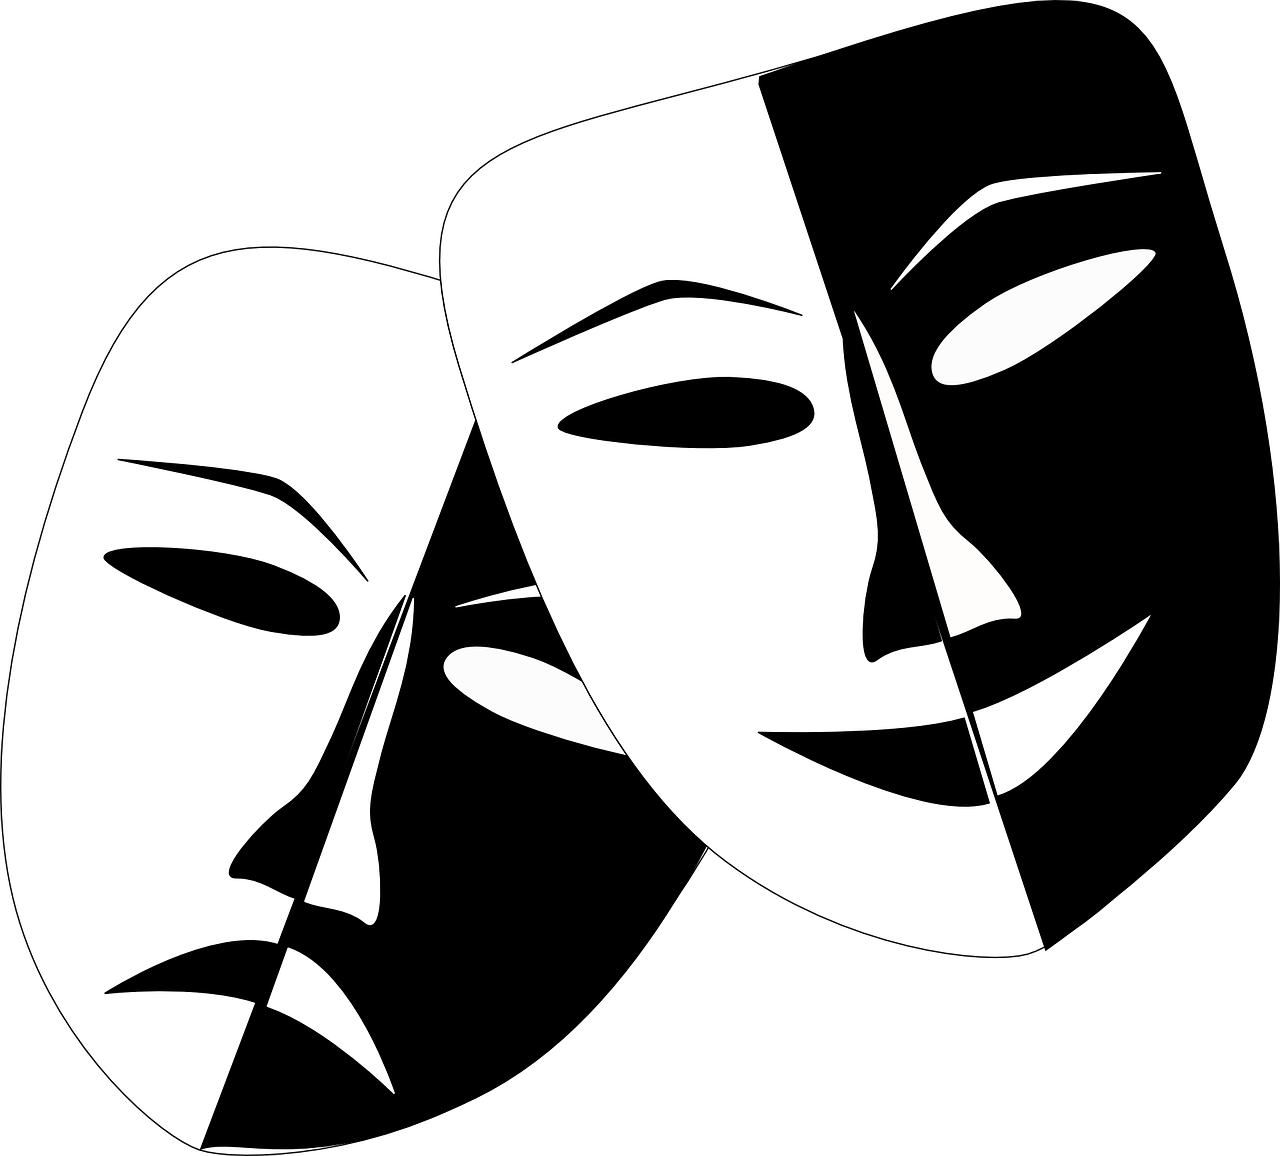 drama, life, shakespeare, play